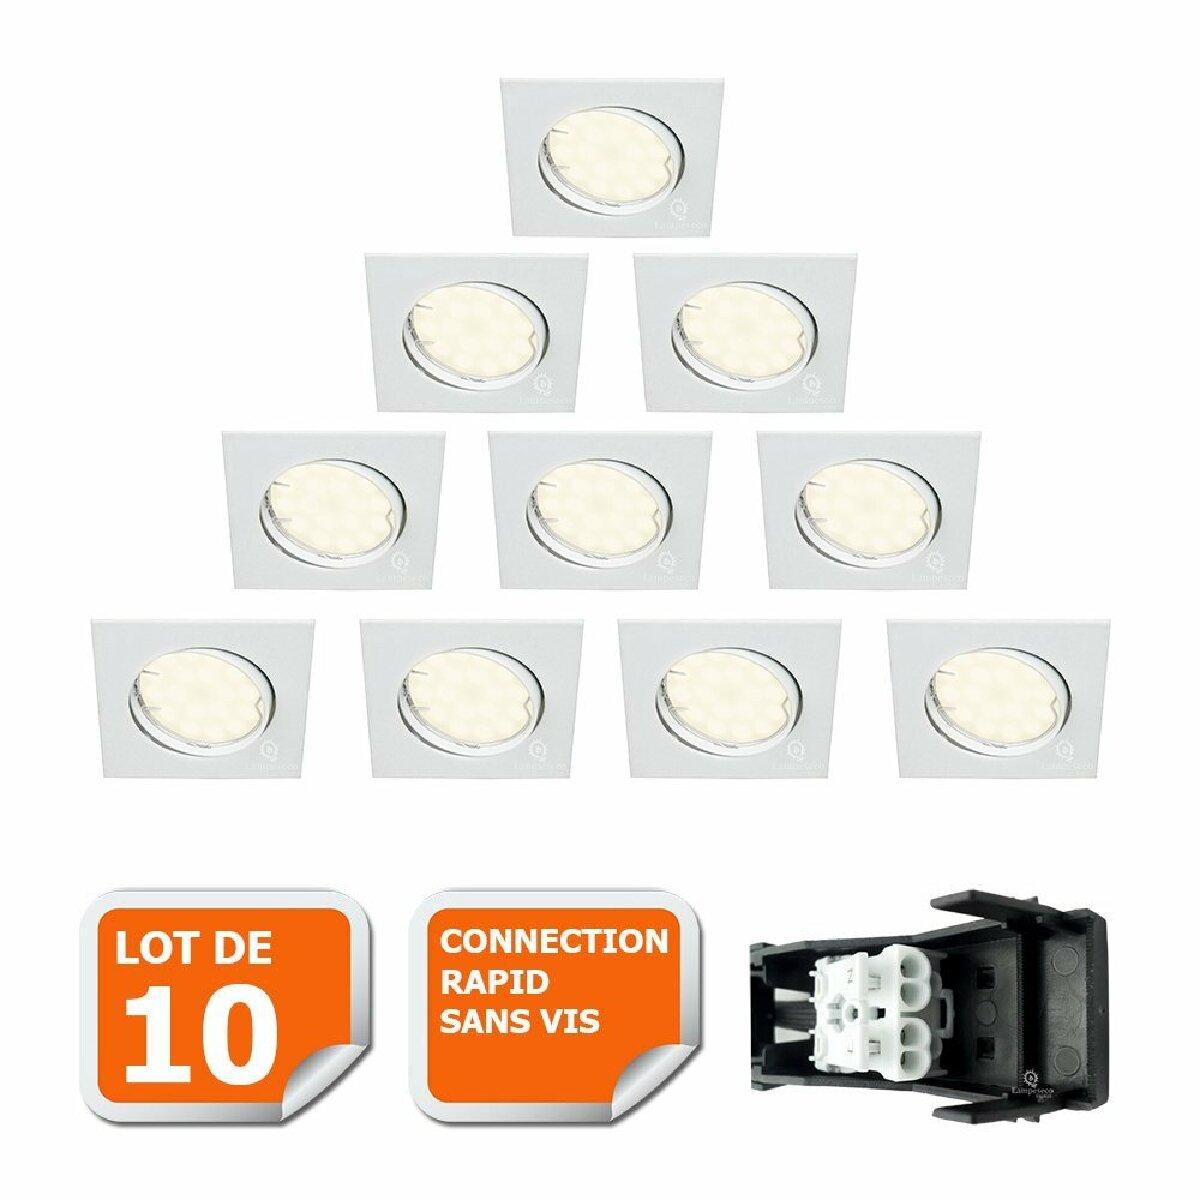 Eurobryte LOT DE 10 SPOT ENCASTRABLE ORIENTABLE CARRE LED SMD GU10 230V BLANC RENDU ENVIRON 50W HALOGENE